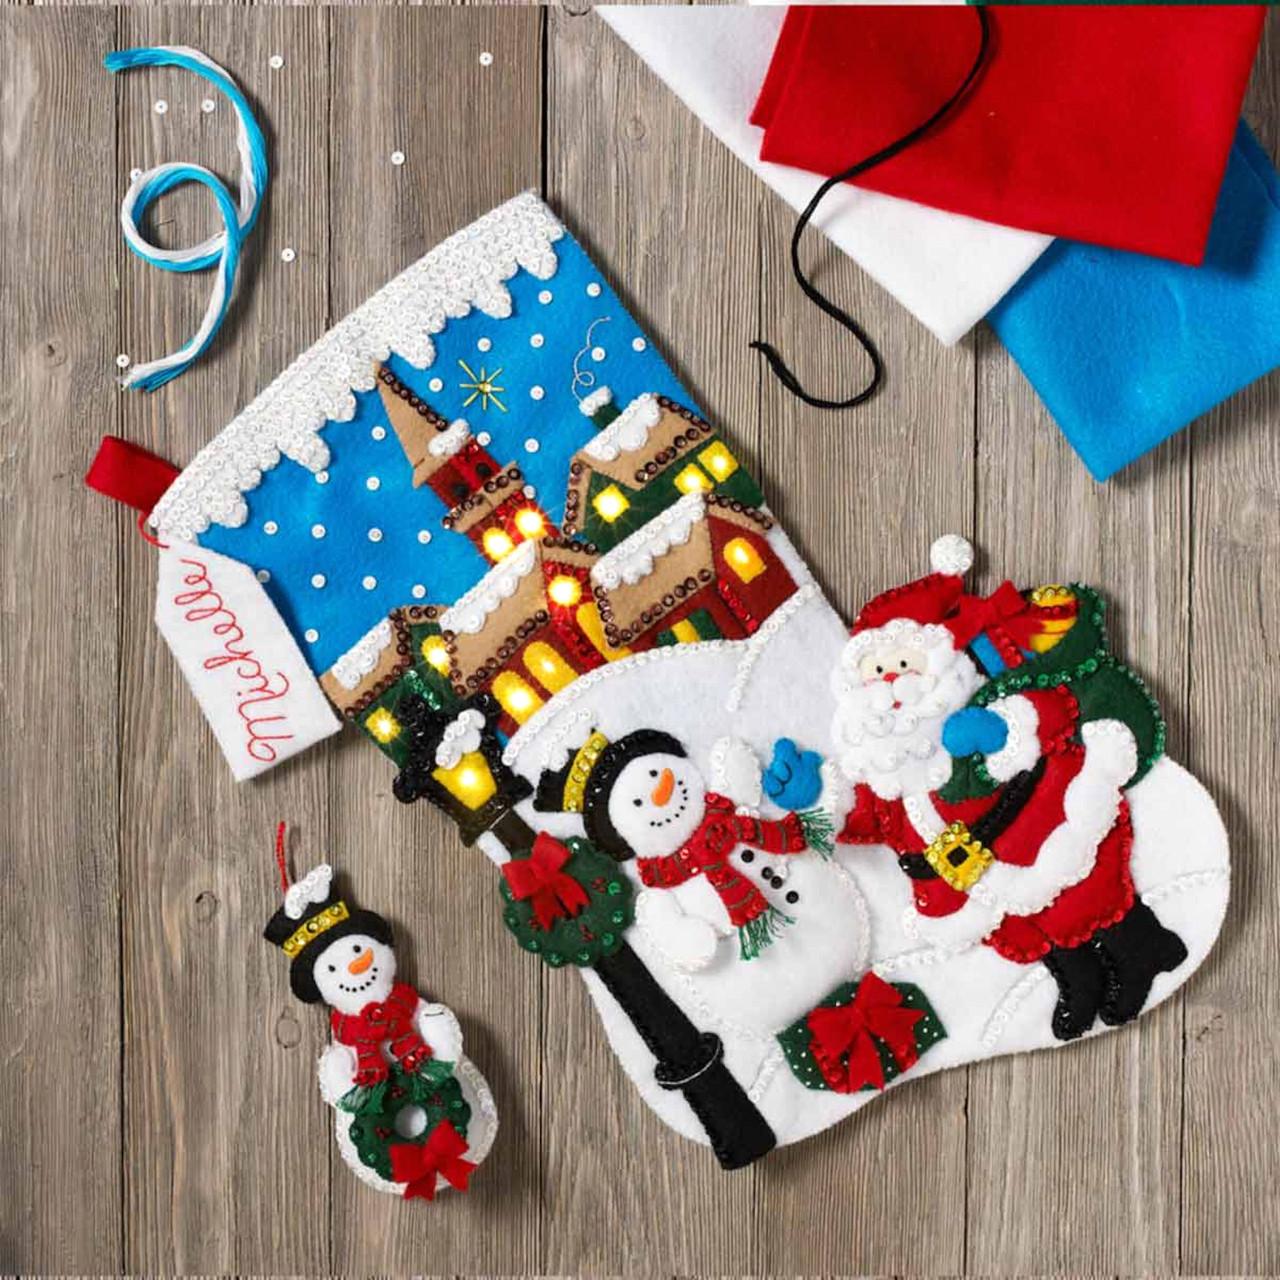 Plaid / Bucilla - Christmas Village Stocking w/Lights